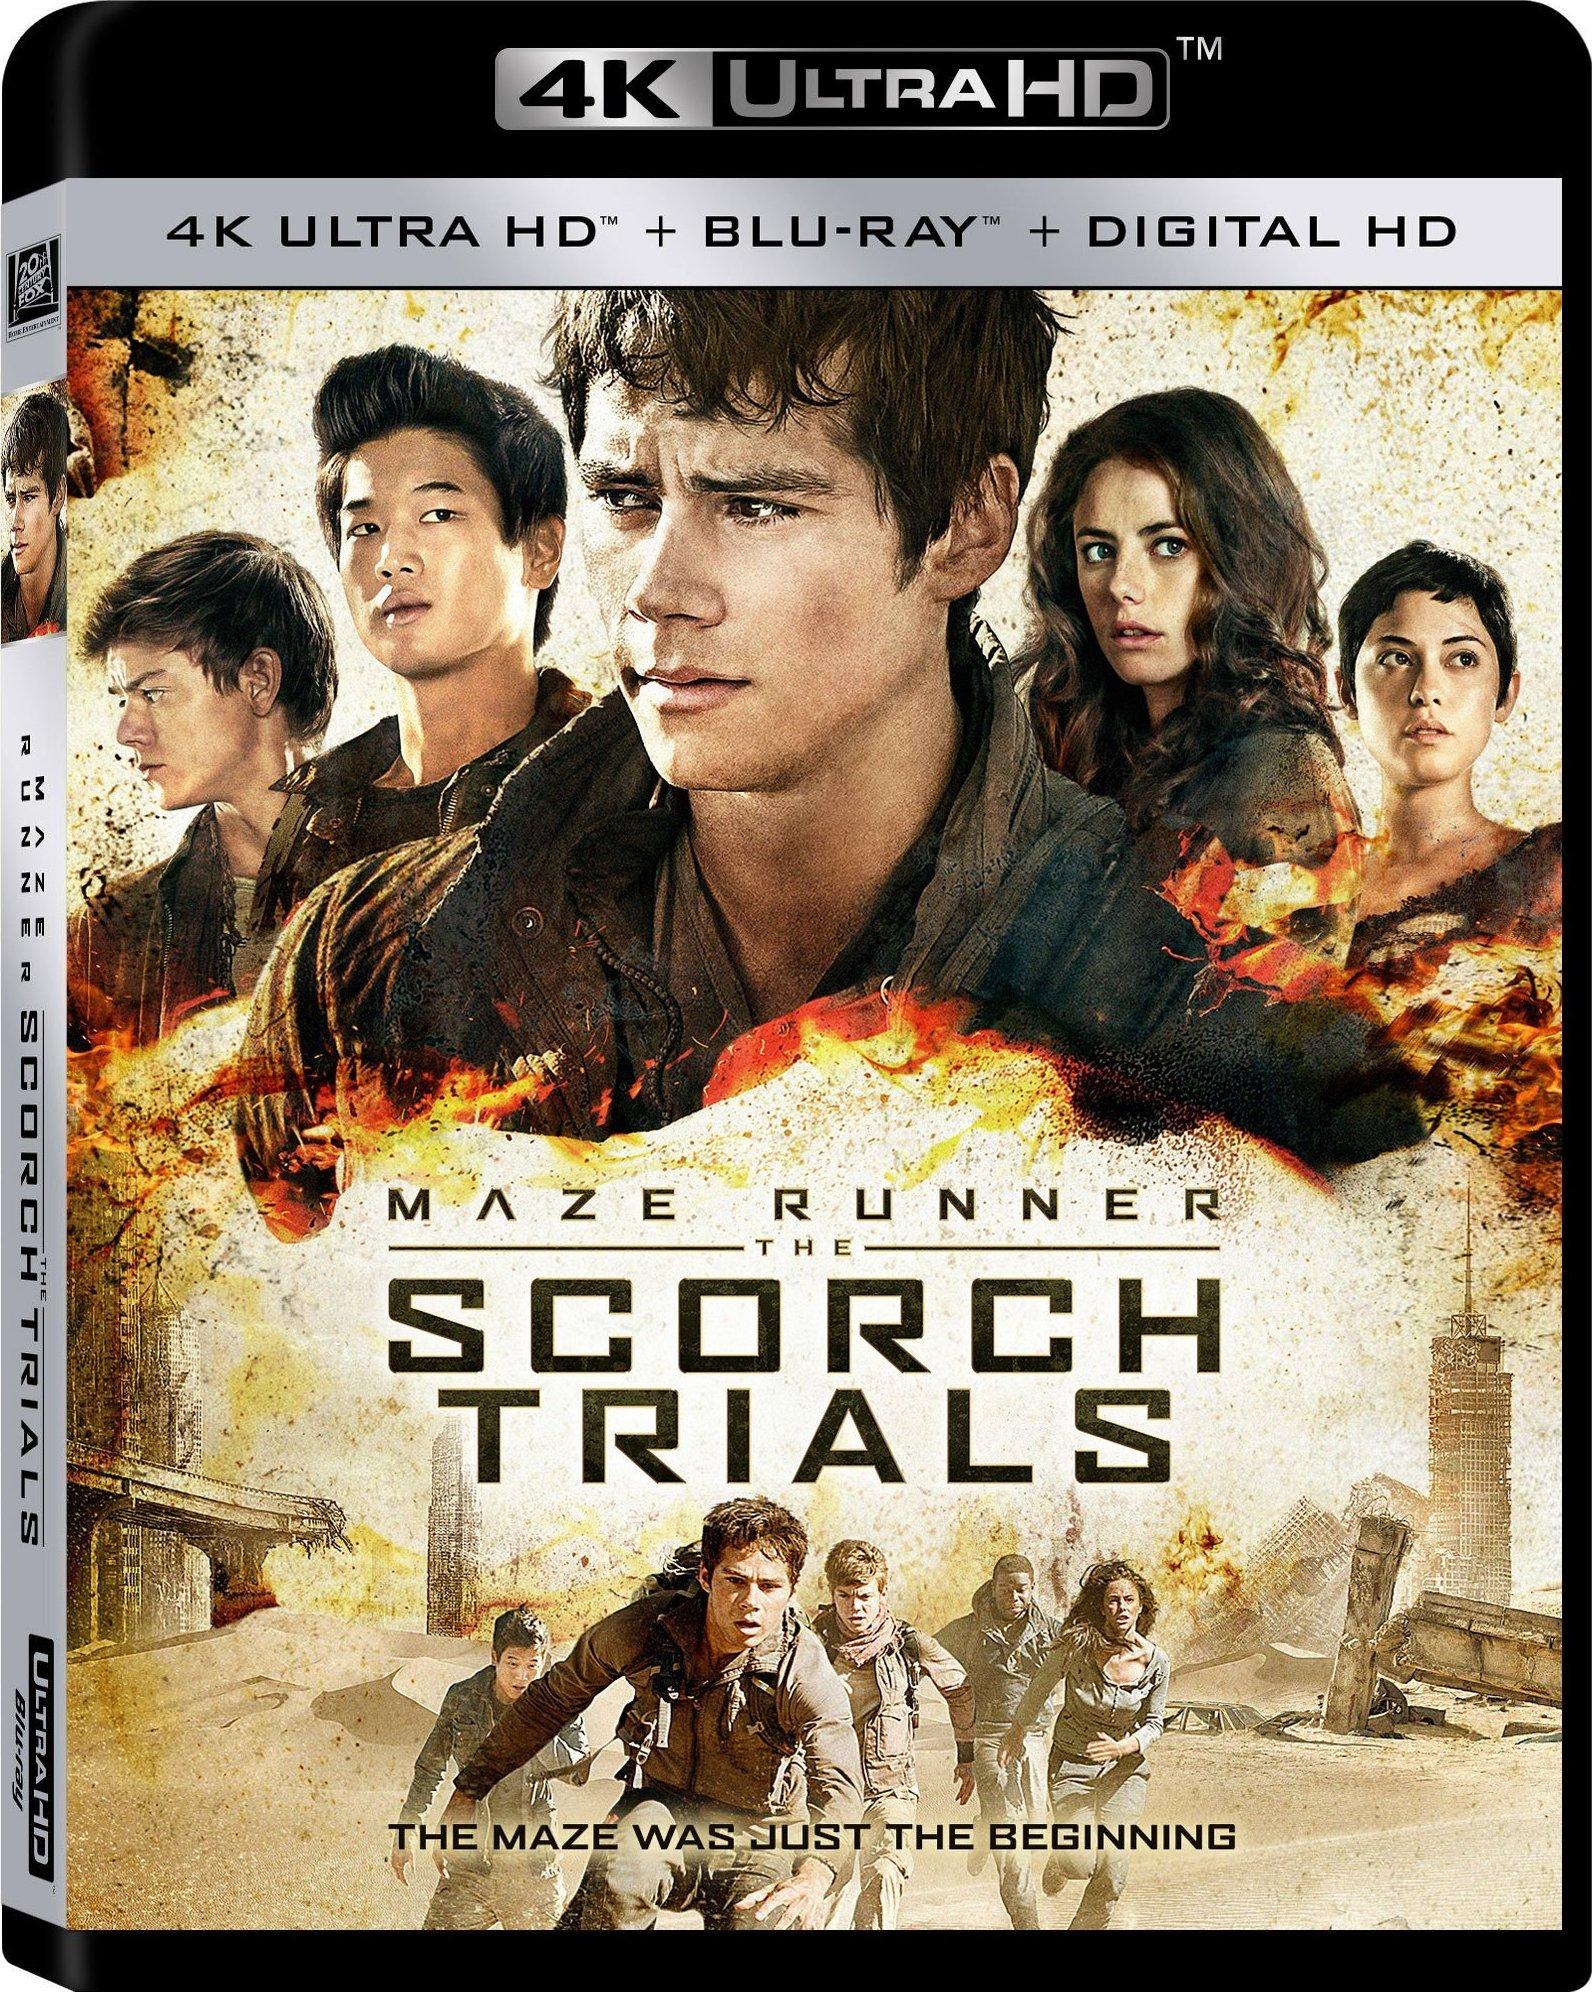 Maze Runner: The Scorch Trials (2015) 4K Ultra HD Blu-ray